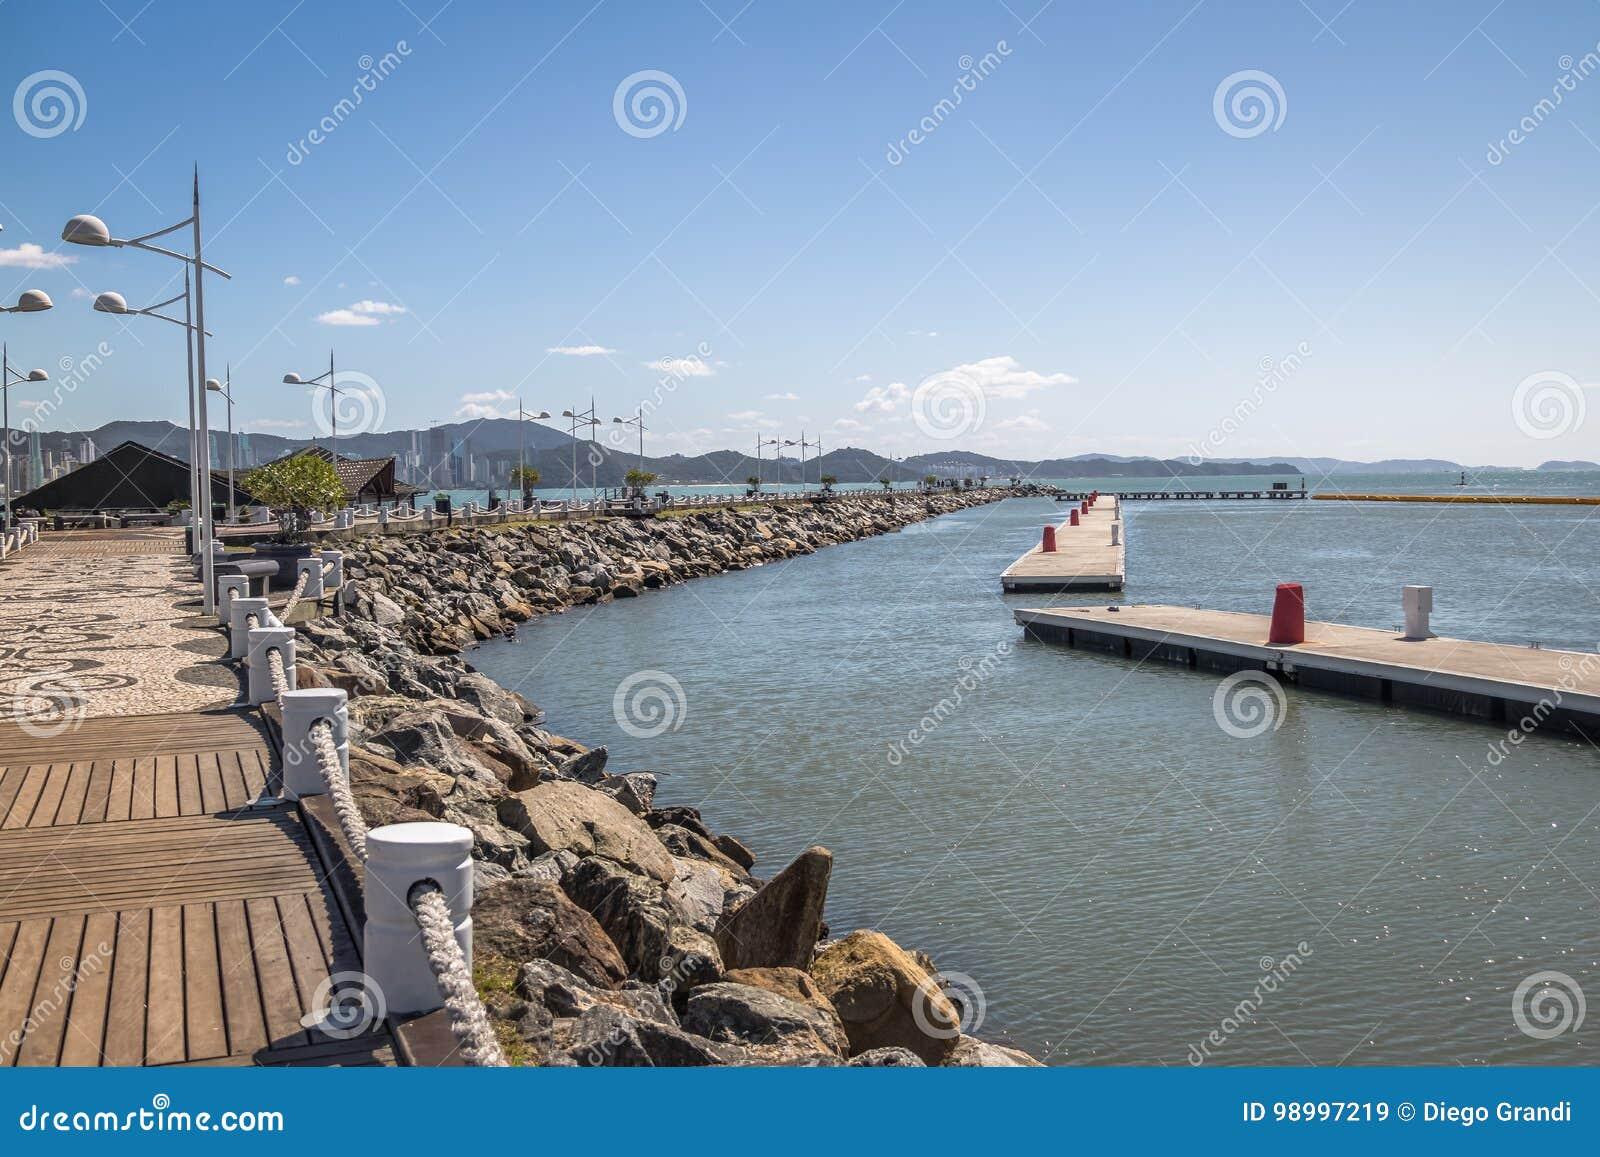 Molhe a Dinamarca Barra Sul Breakwater - Balneario Camboriu, Santa Catarina, Brasil